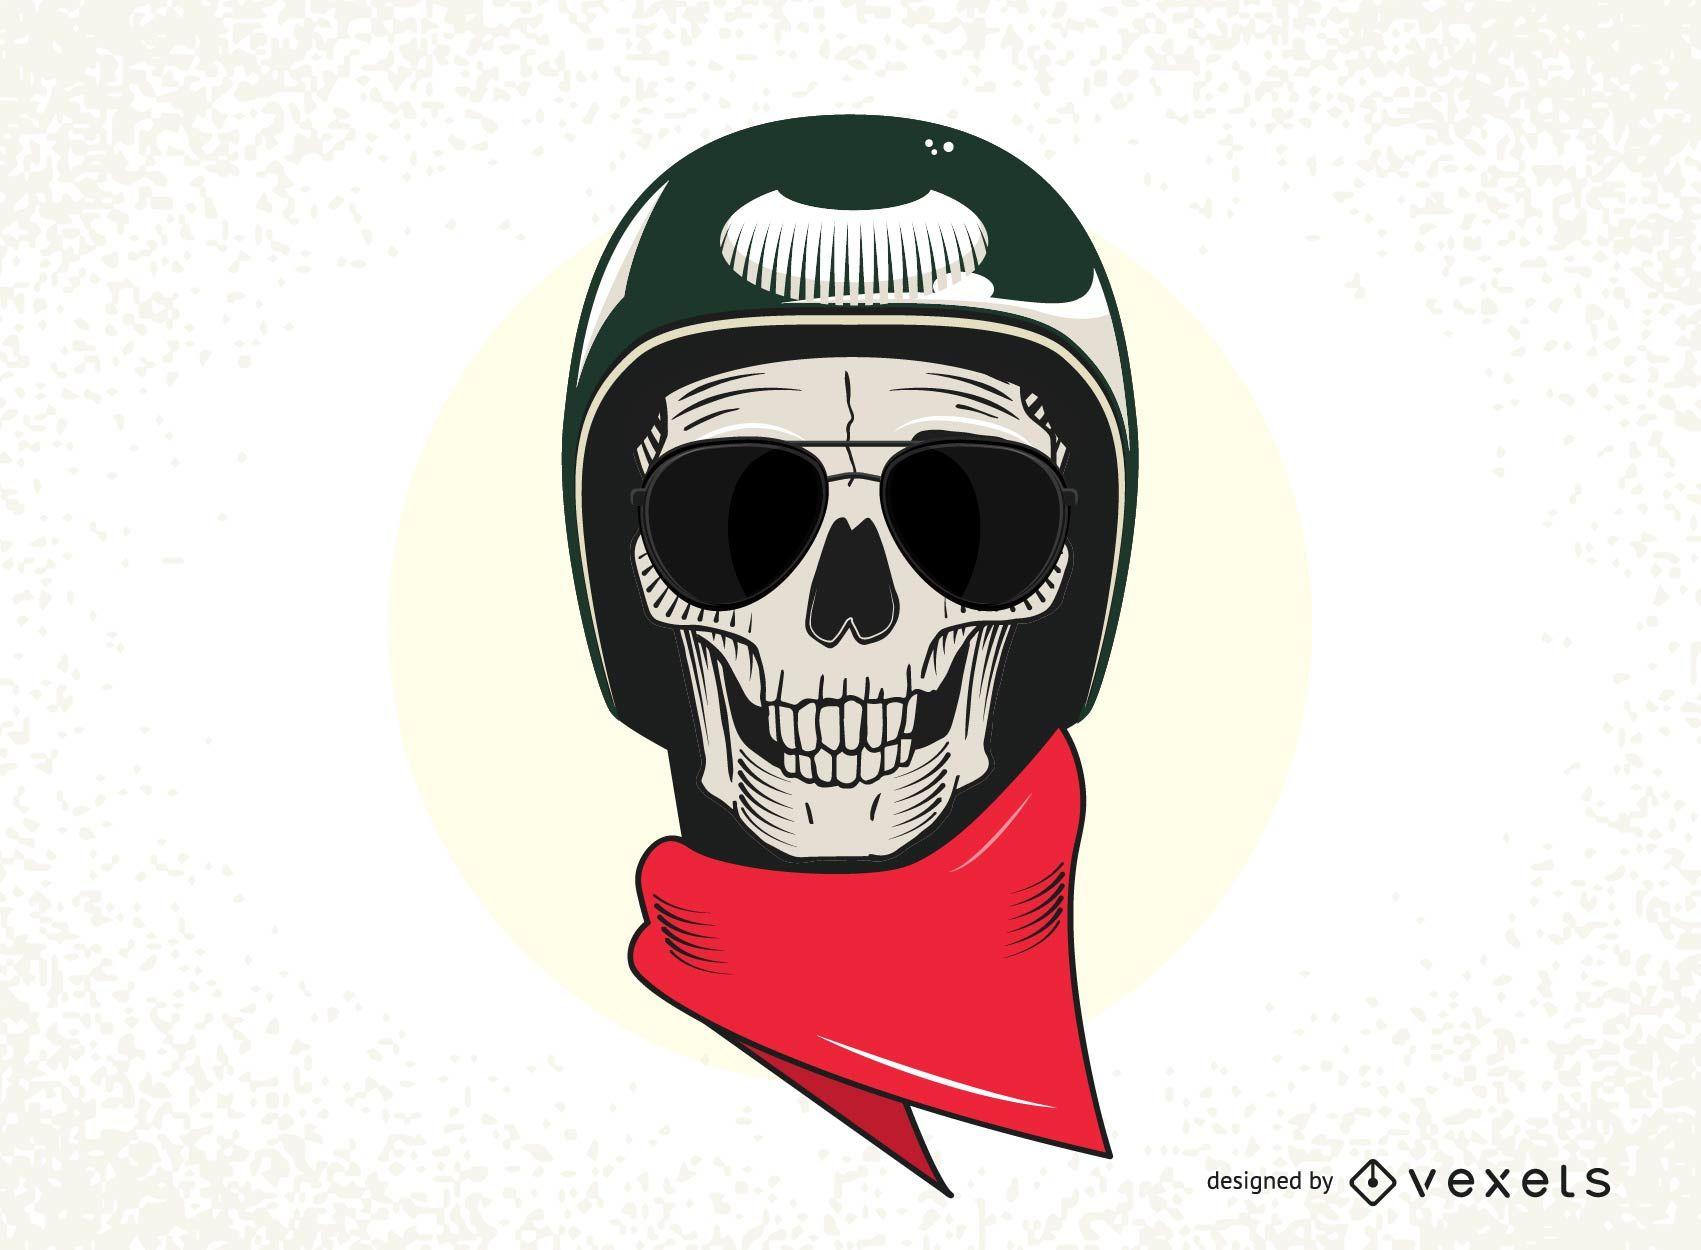 1701x1250 Skull With Military Helmet Vector